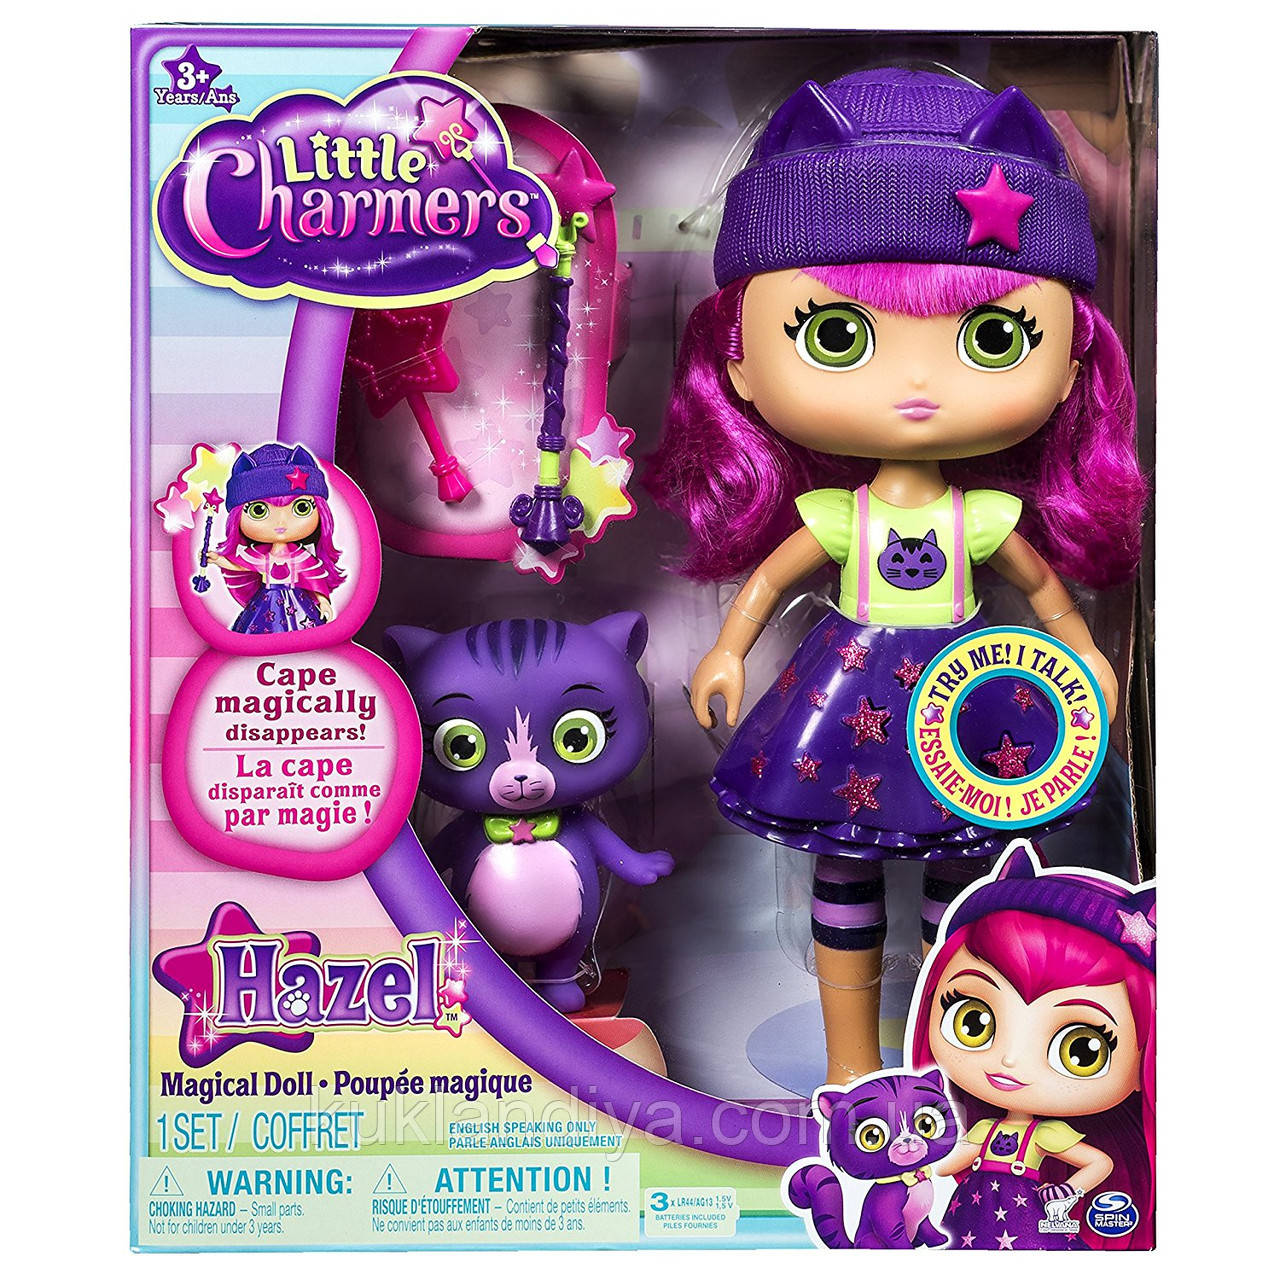 Інтерактивна Лялька Хейзл Little Charmers Hazel